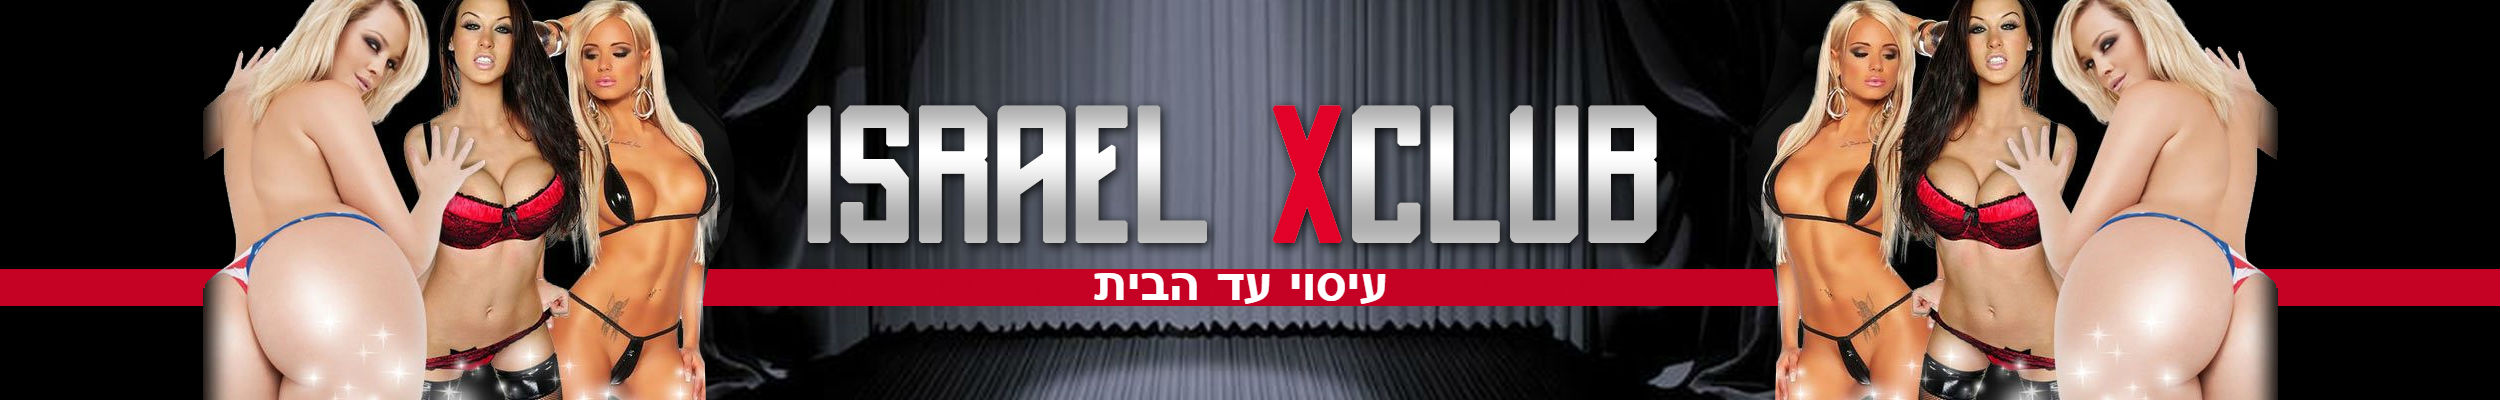 israel xclub